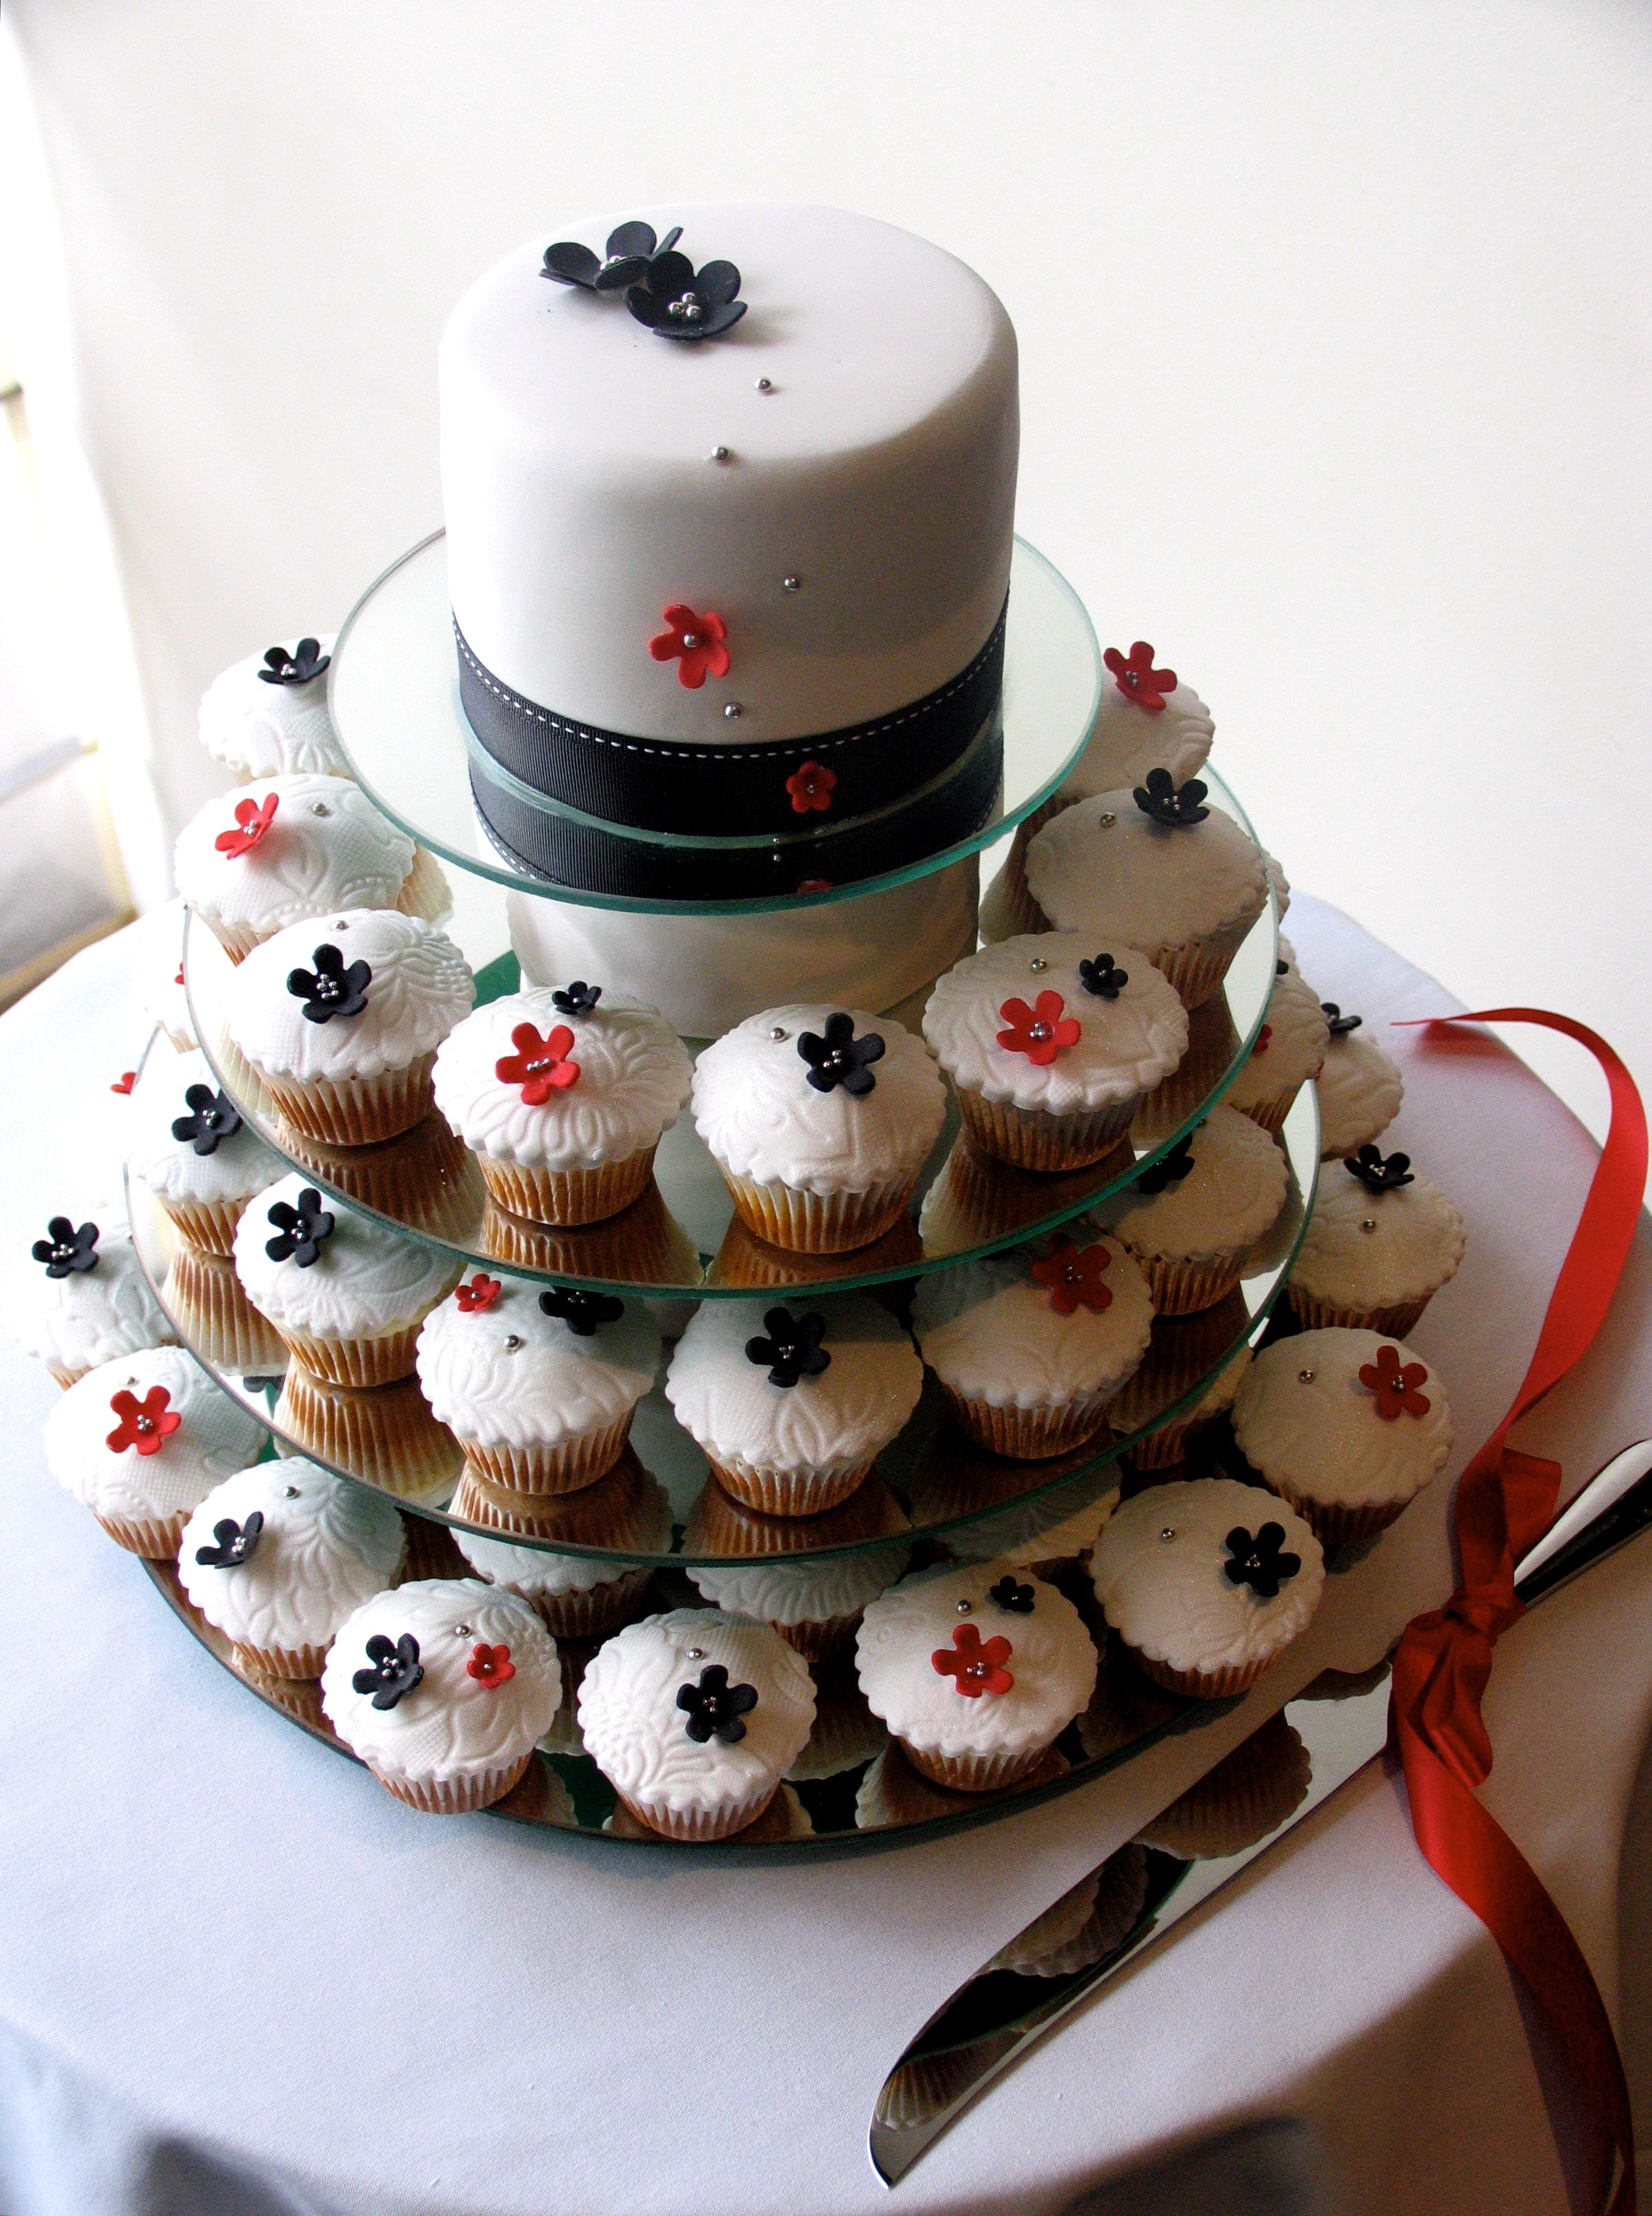 cake made of cupcakes